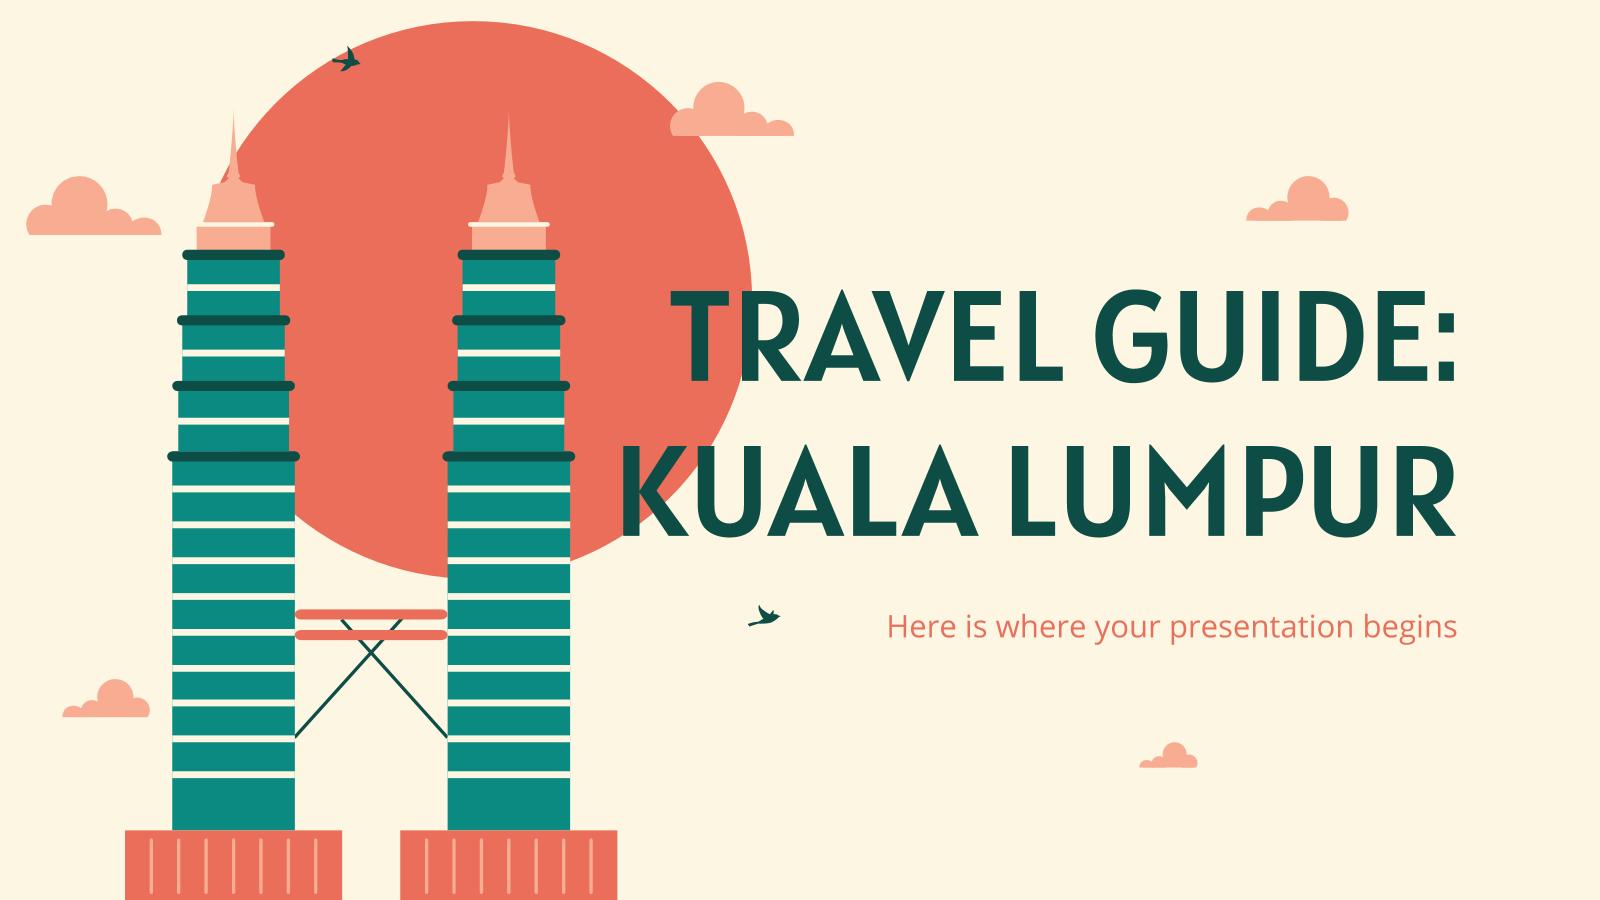 Travel Guide: Kuala Lumpur presentation template